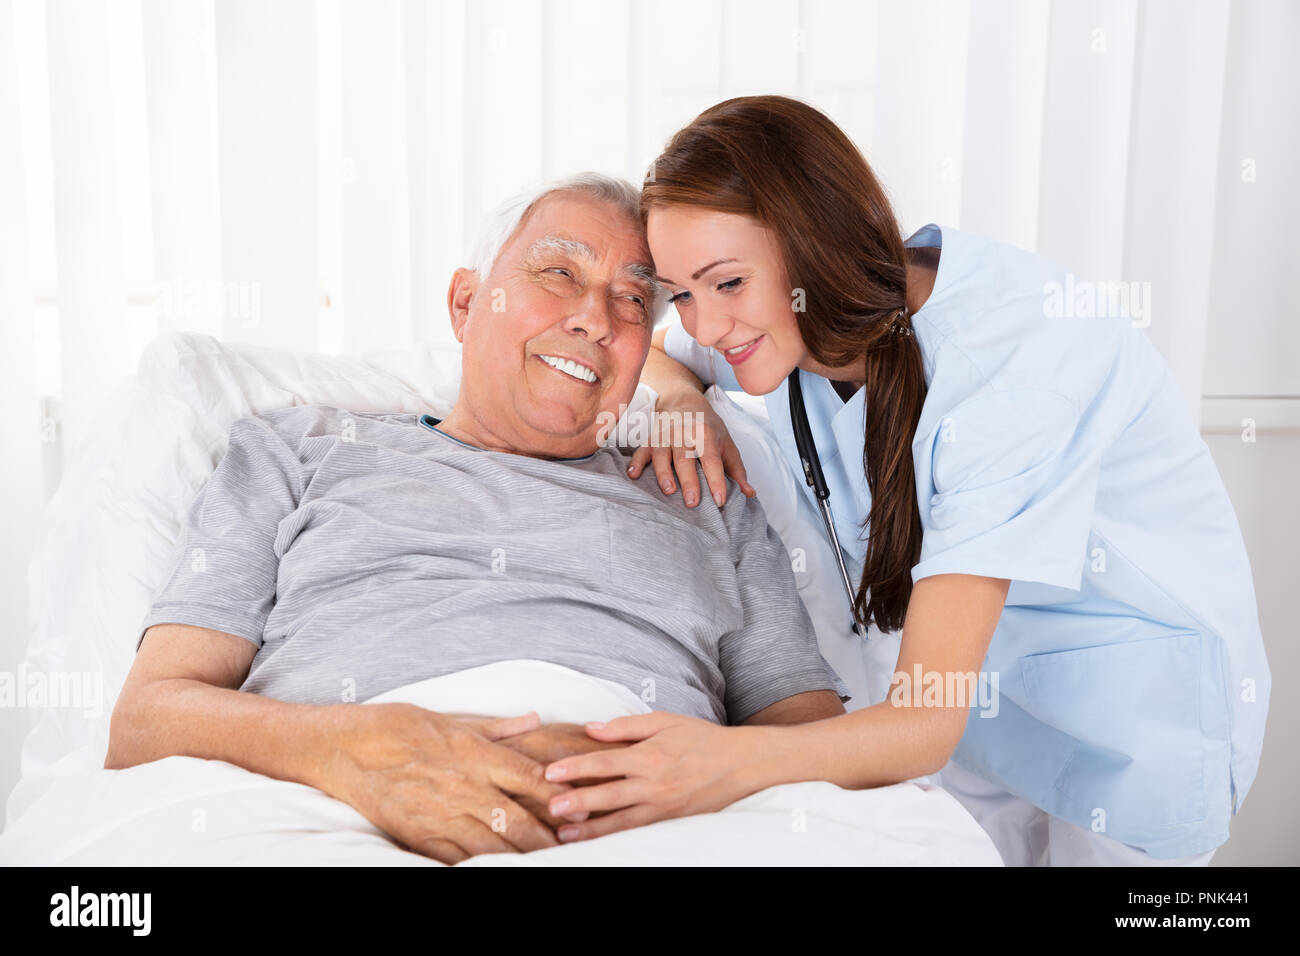 Bett-Krankenhaus Dating-Scan